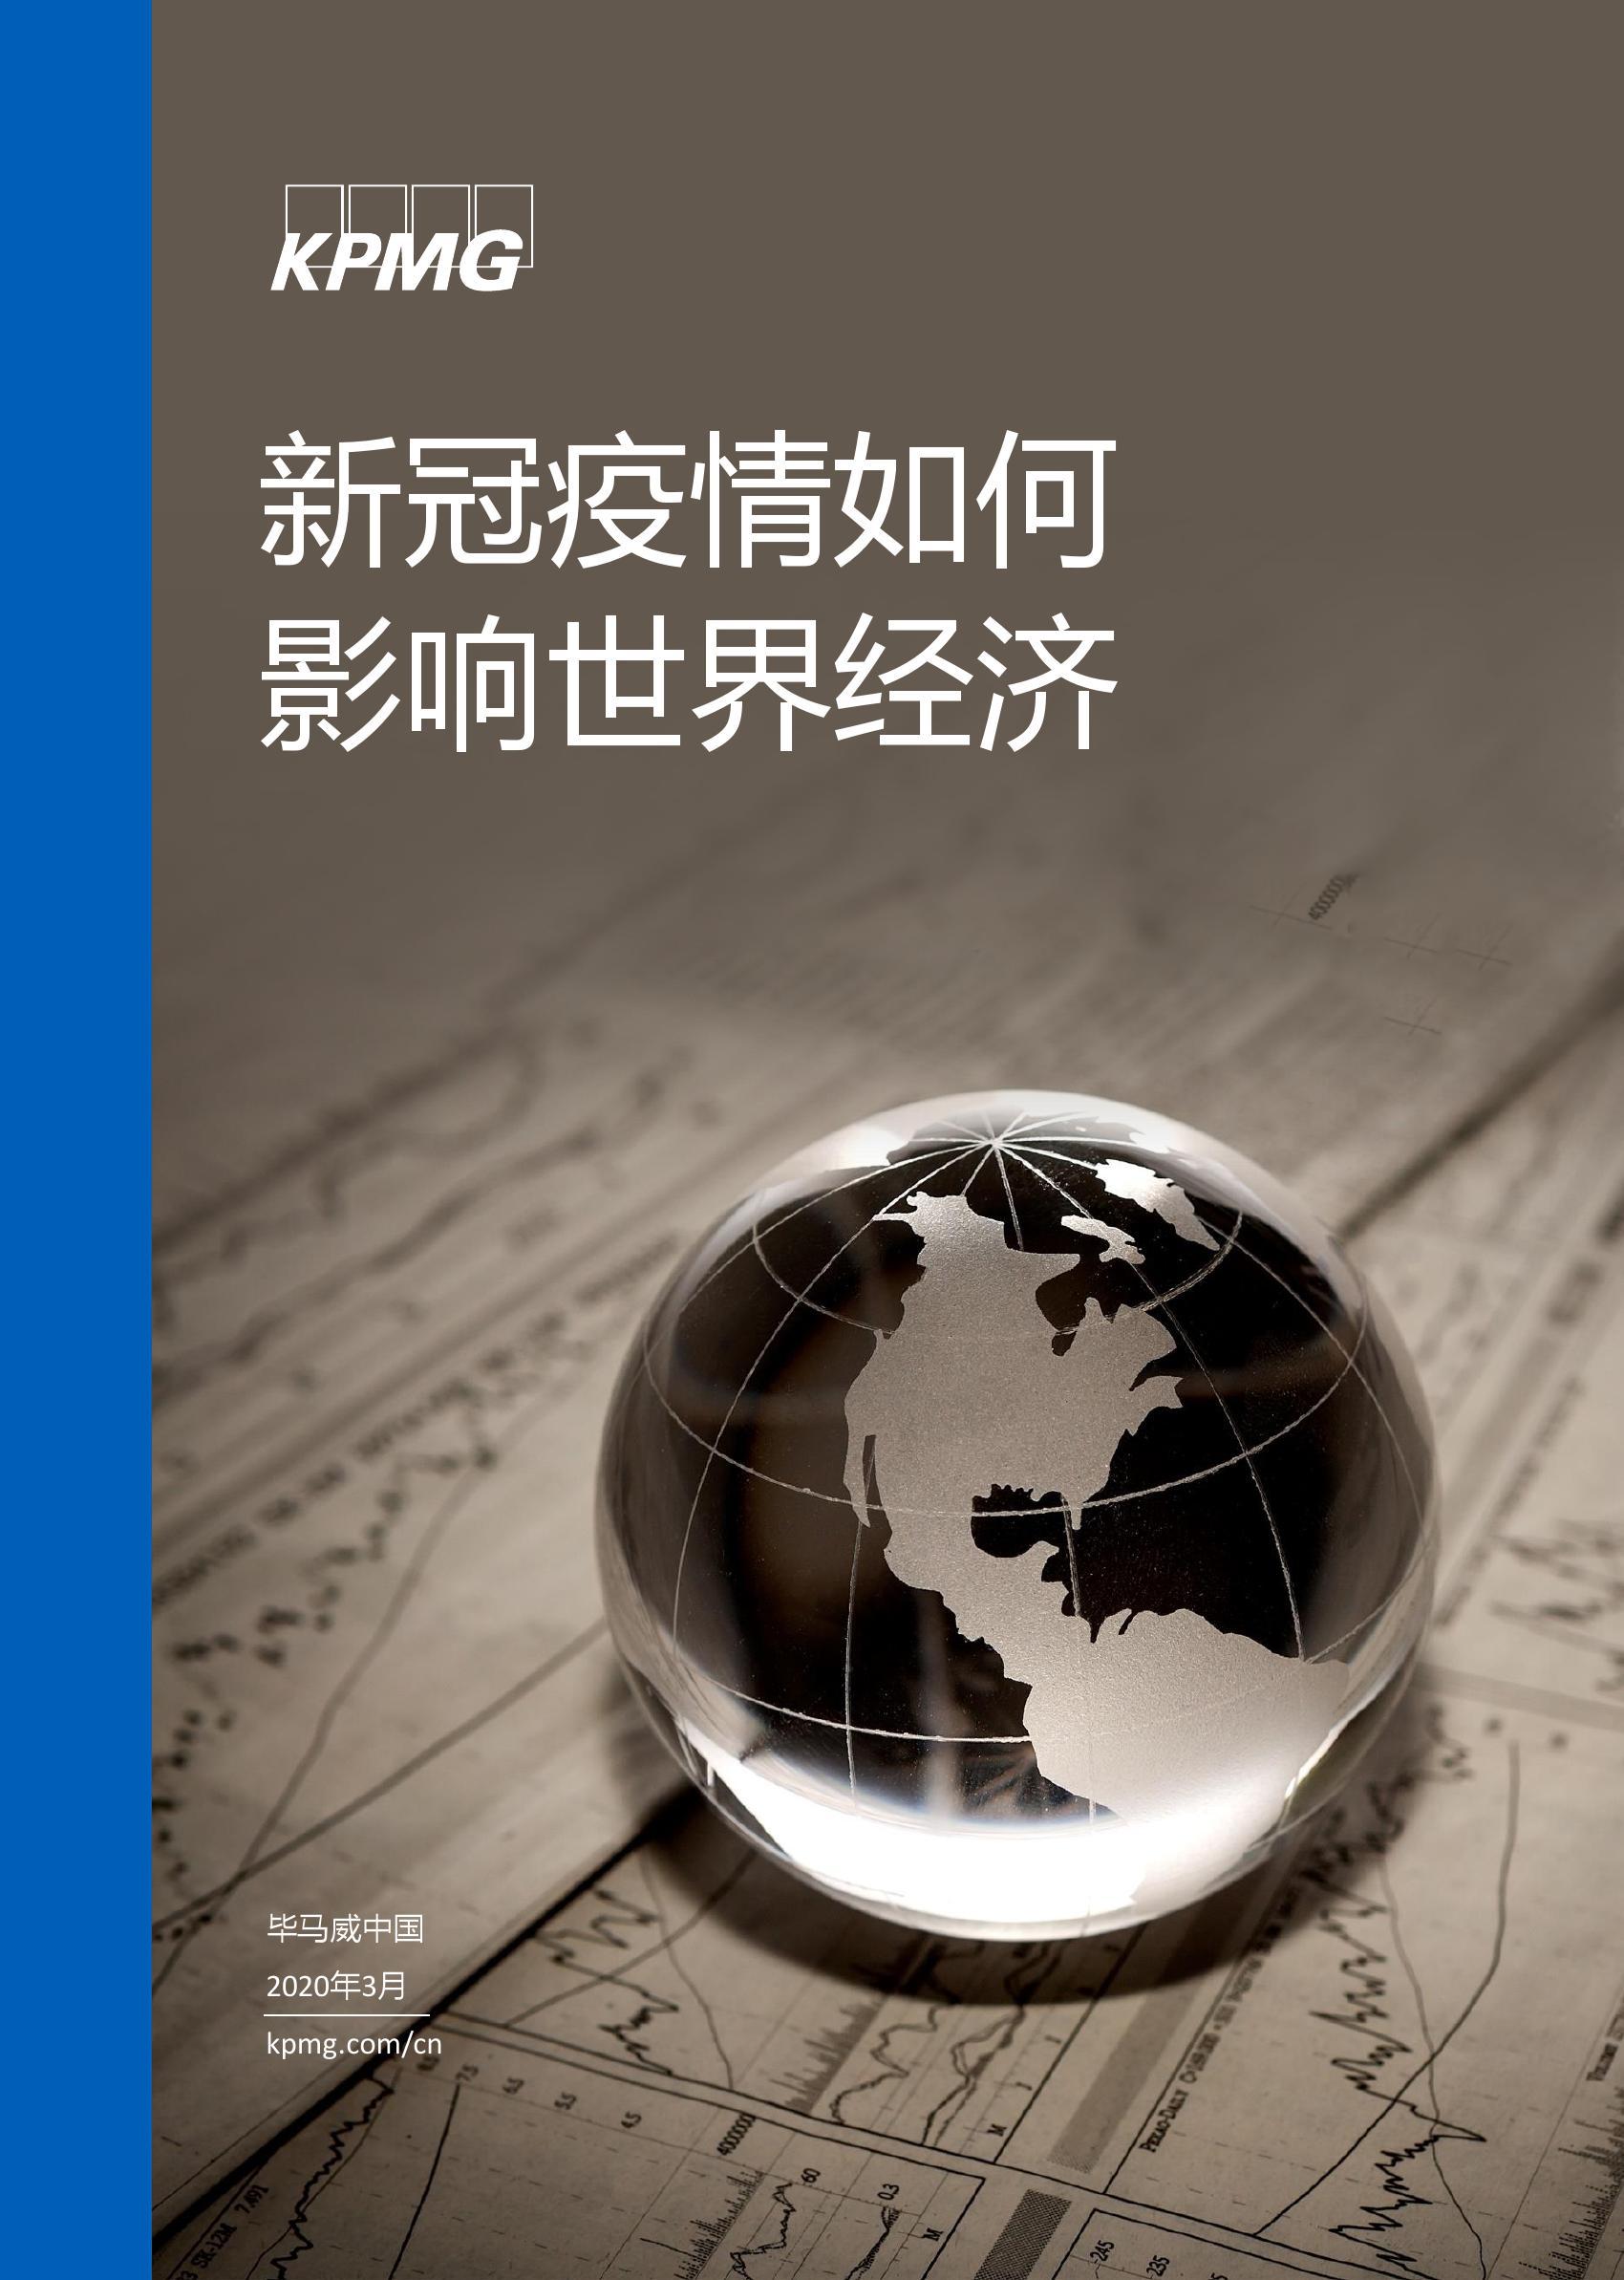 KPMG:新冠疫情如何影响世界经济